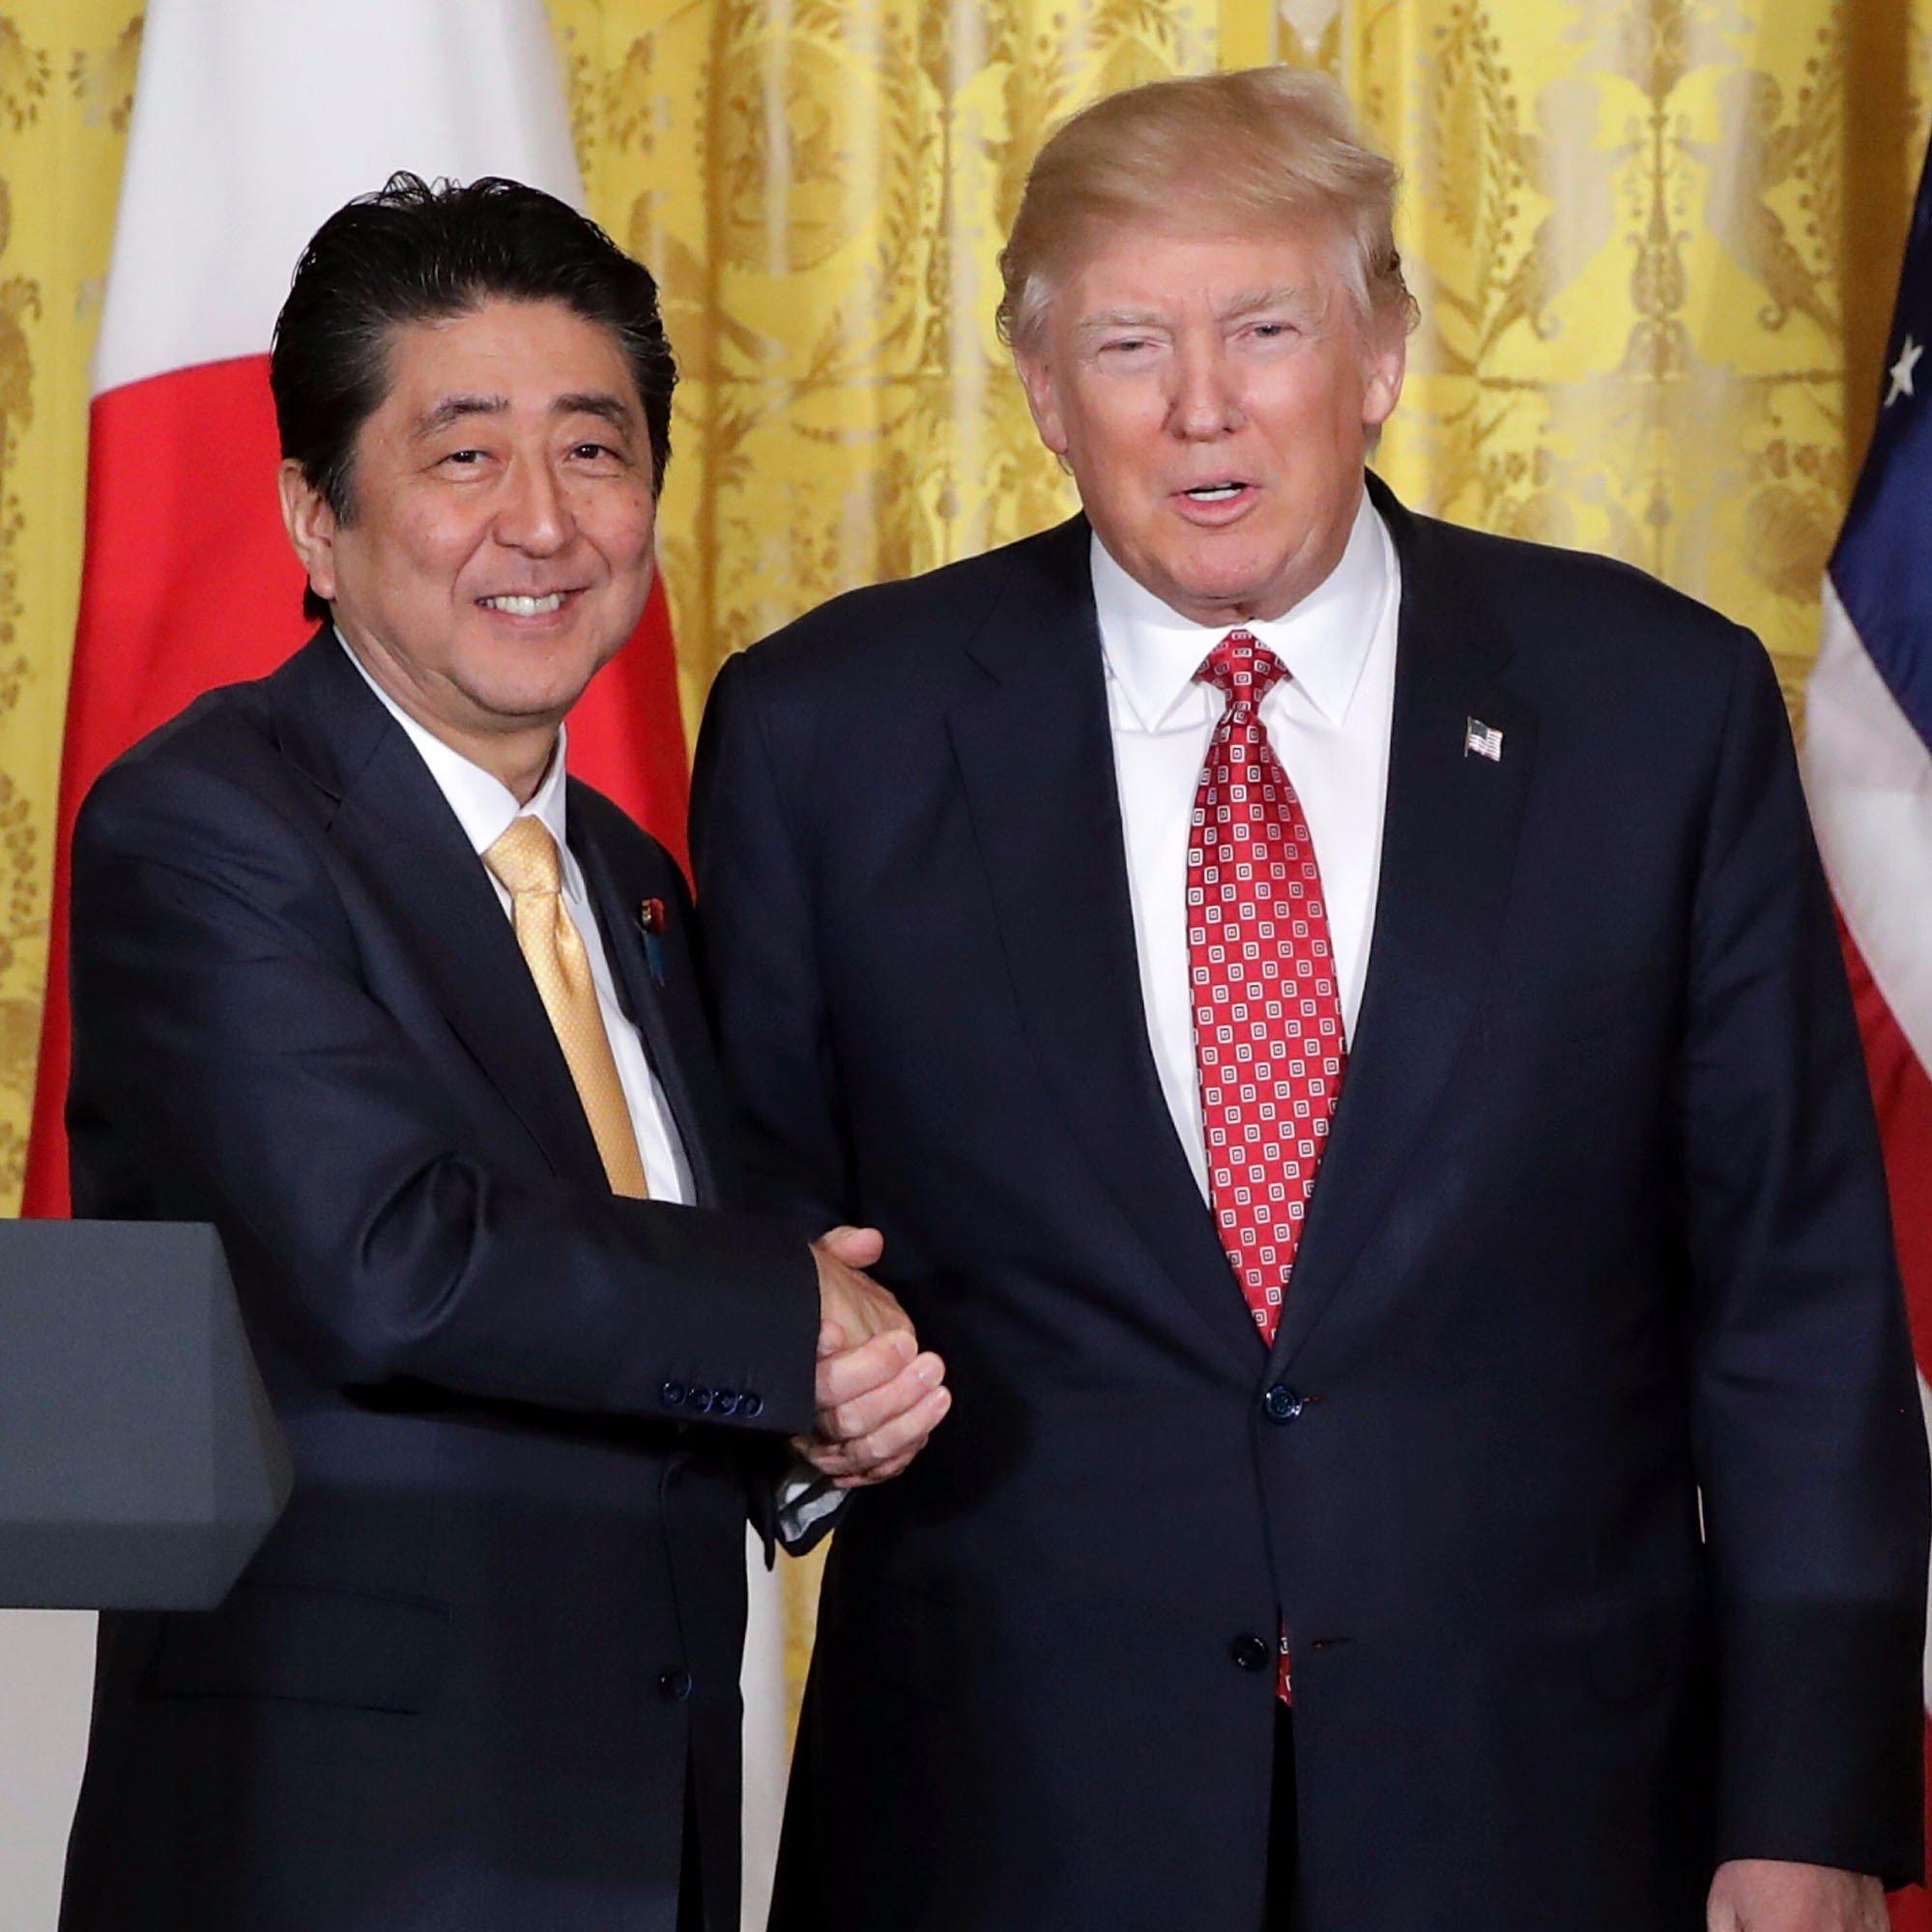 Donald-Trump-Handshake-Prime-Minister-Japan-Memes